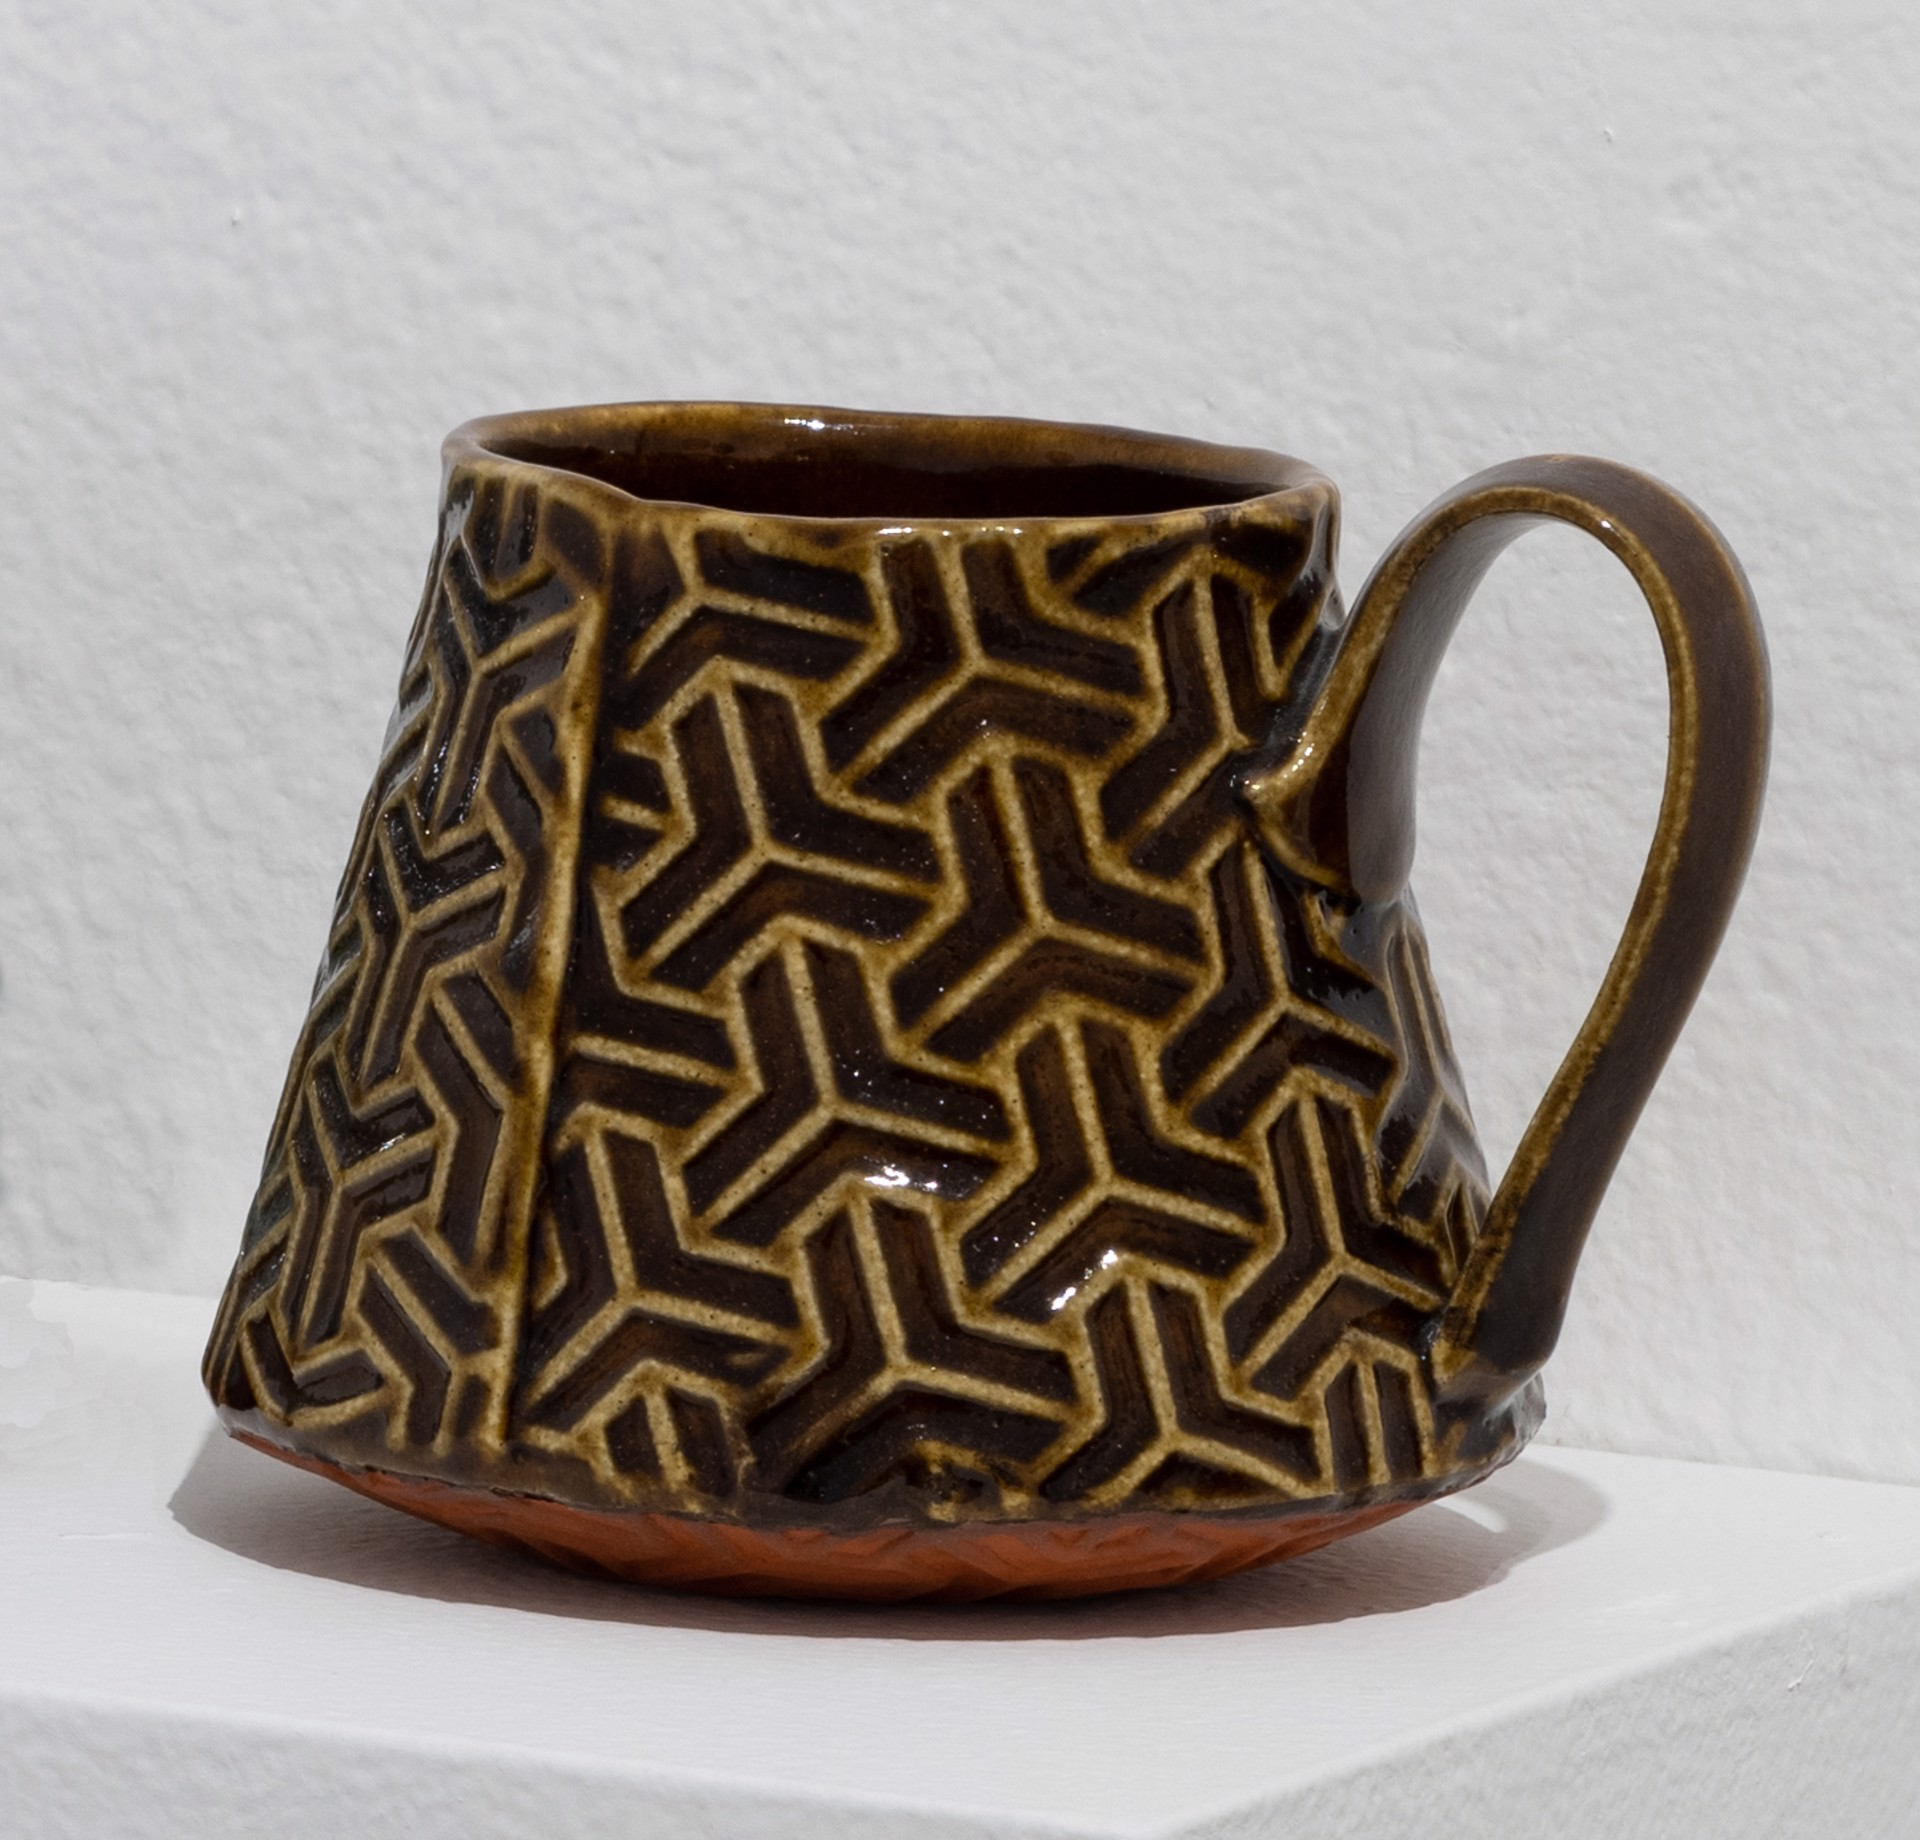 Mug by Jay Jensen